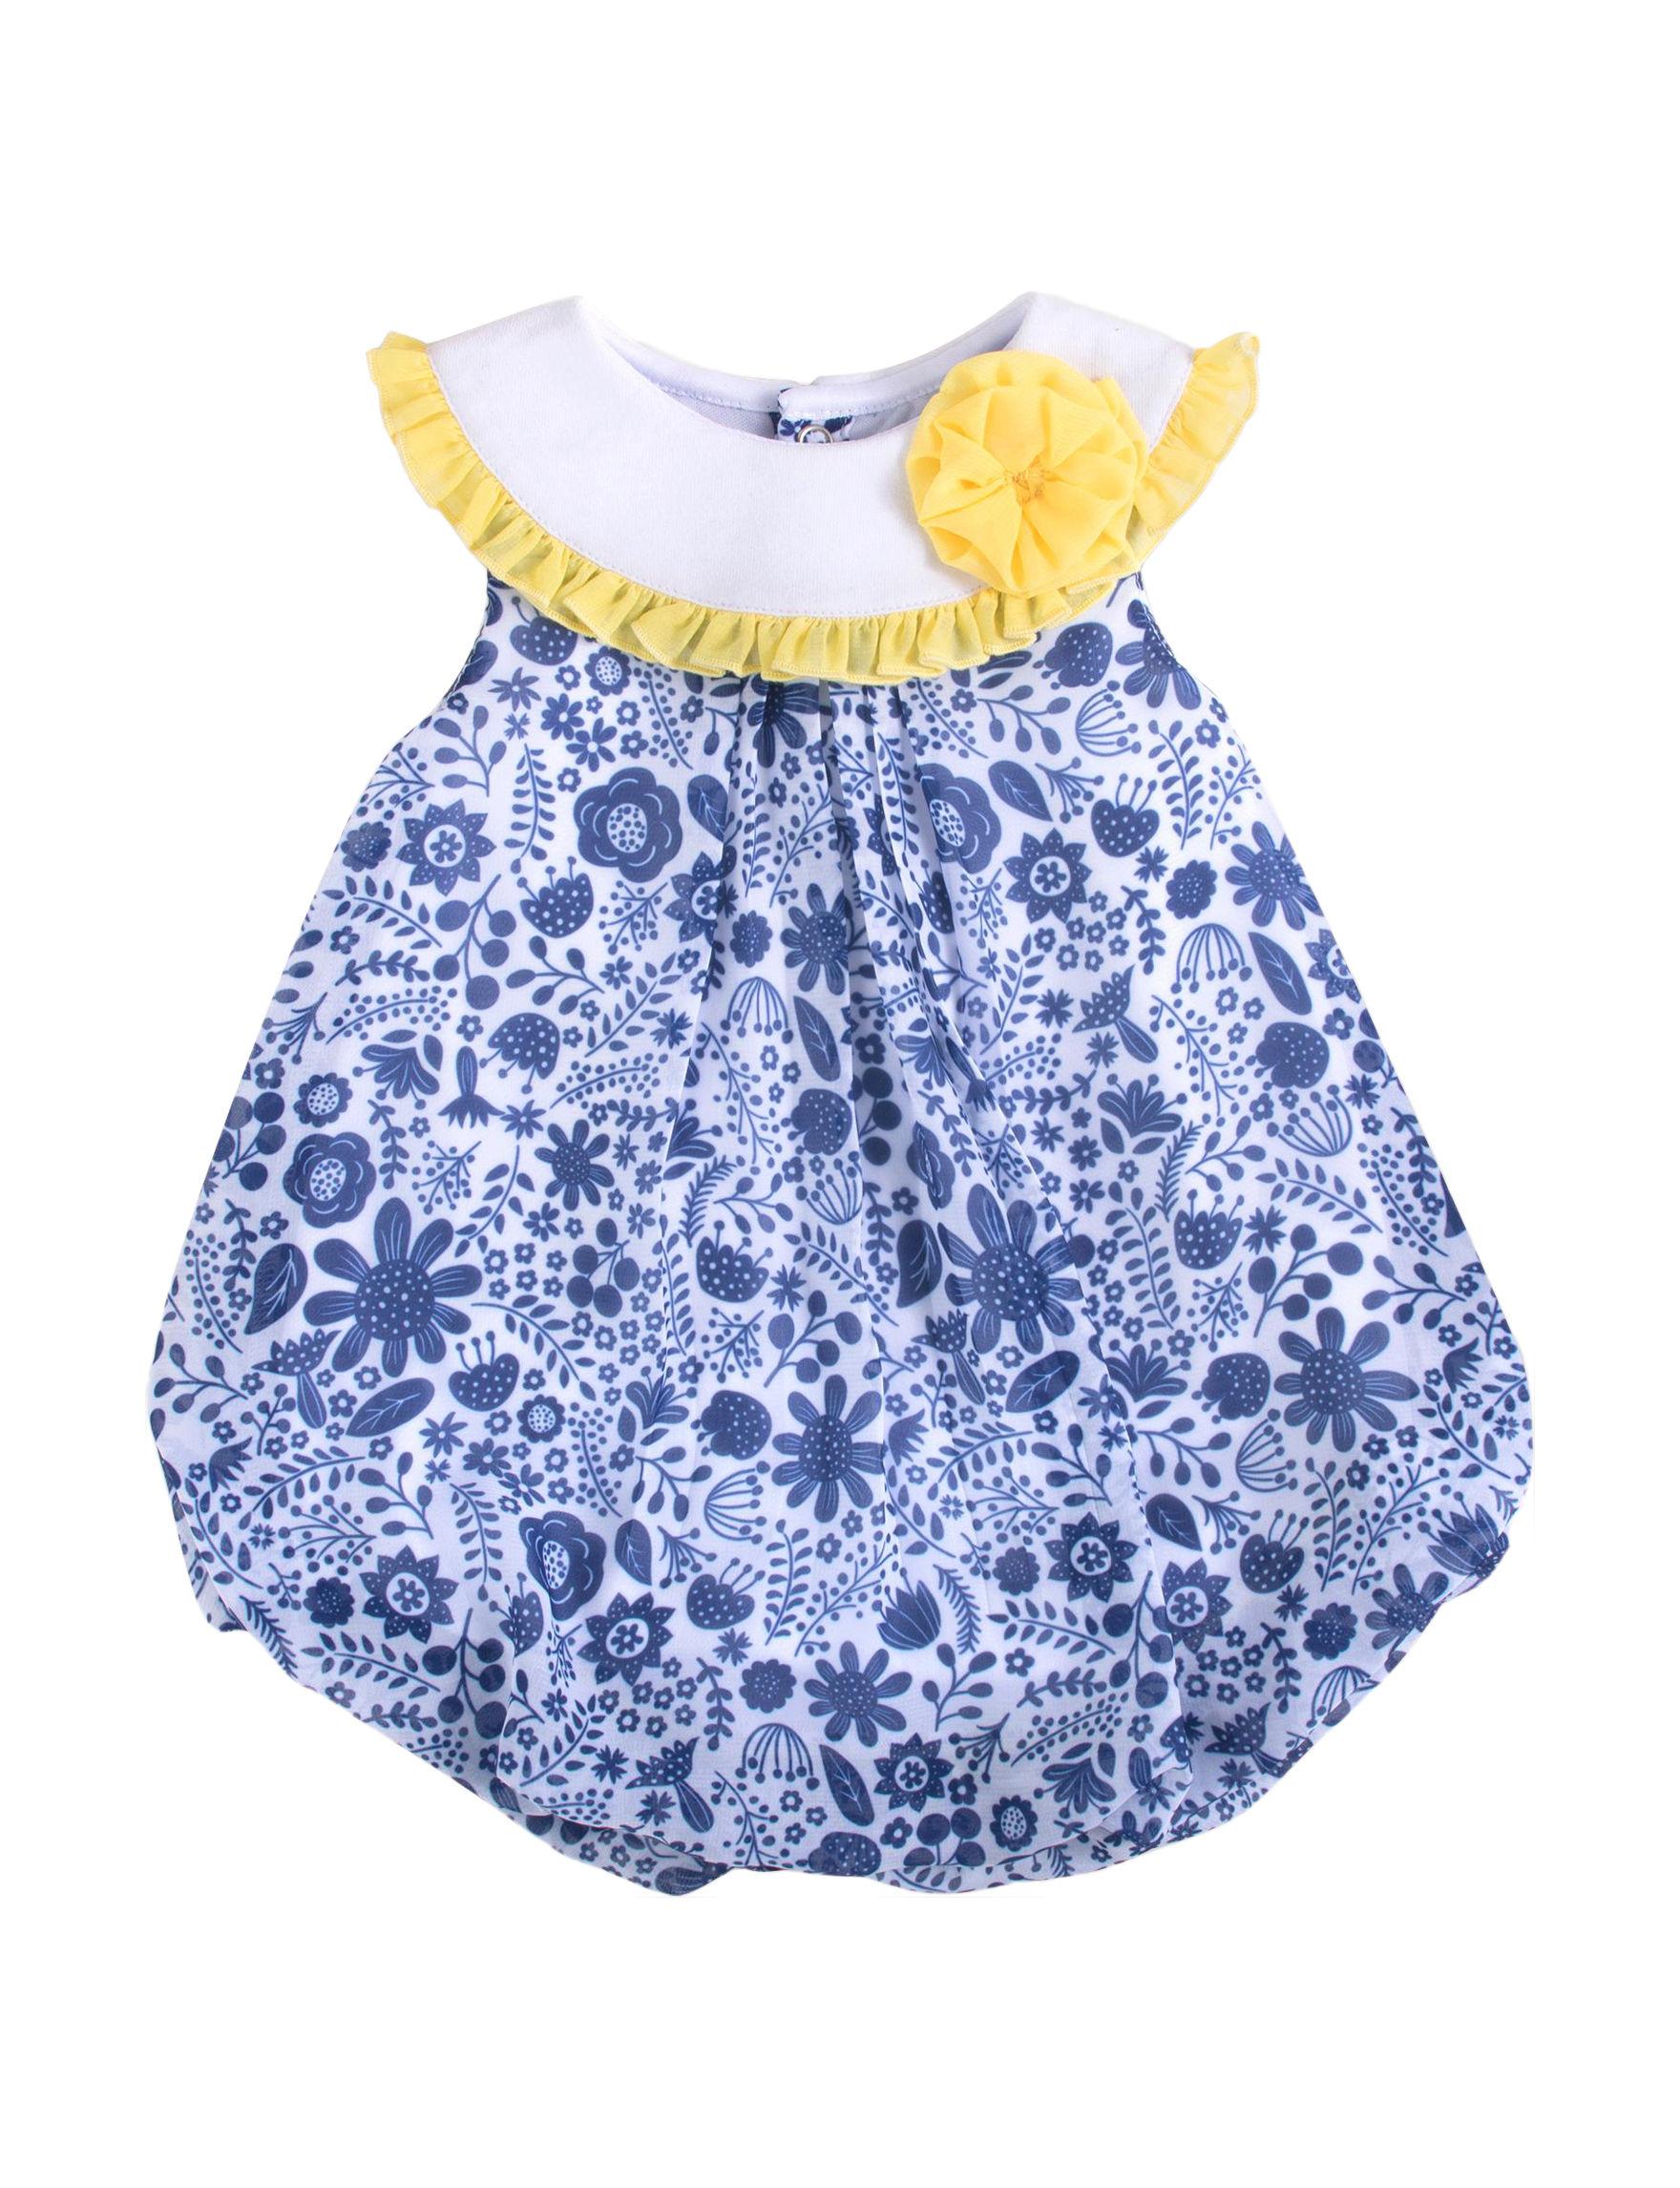 Baby Essentials Blue / White / Yellow